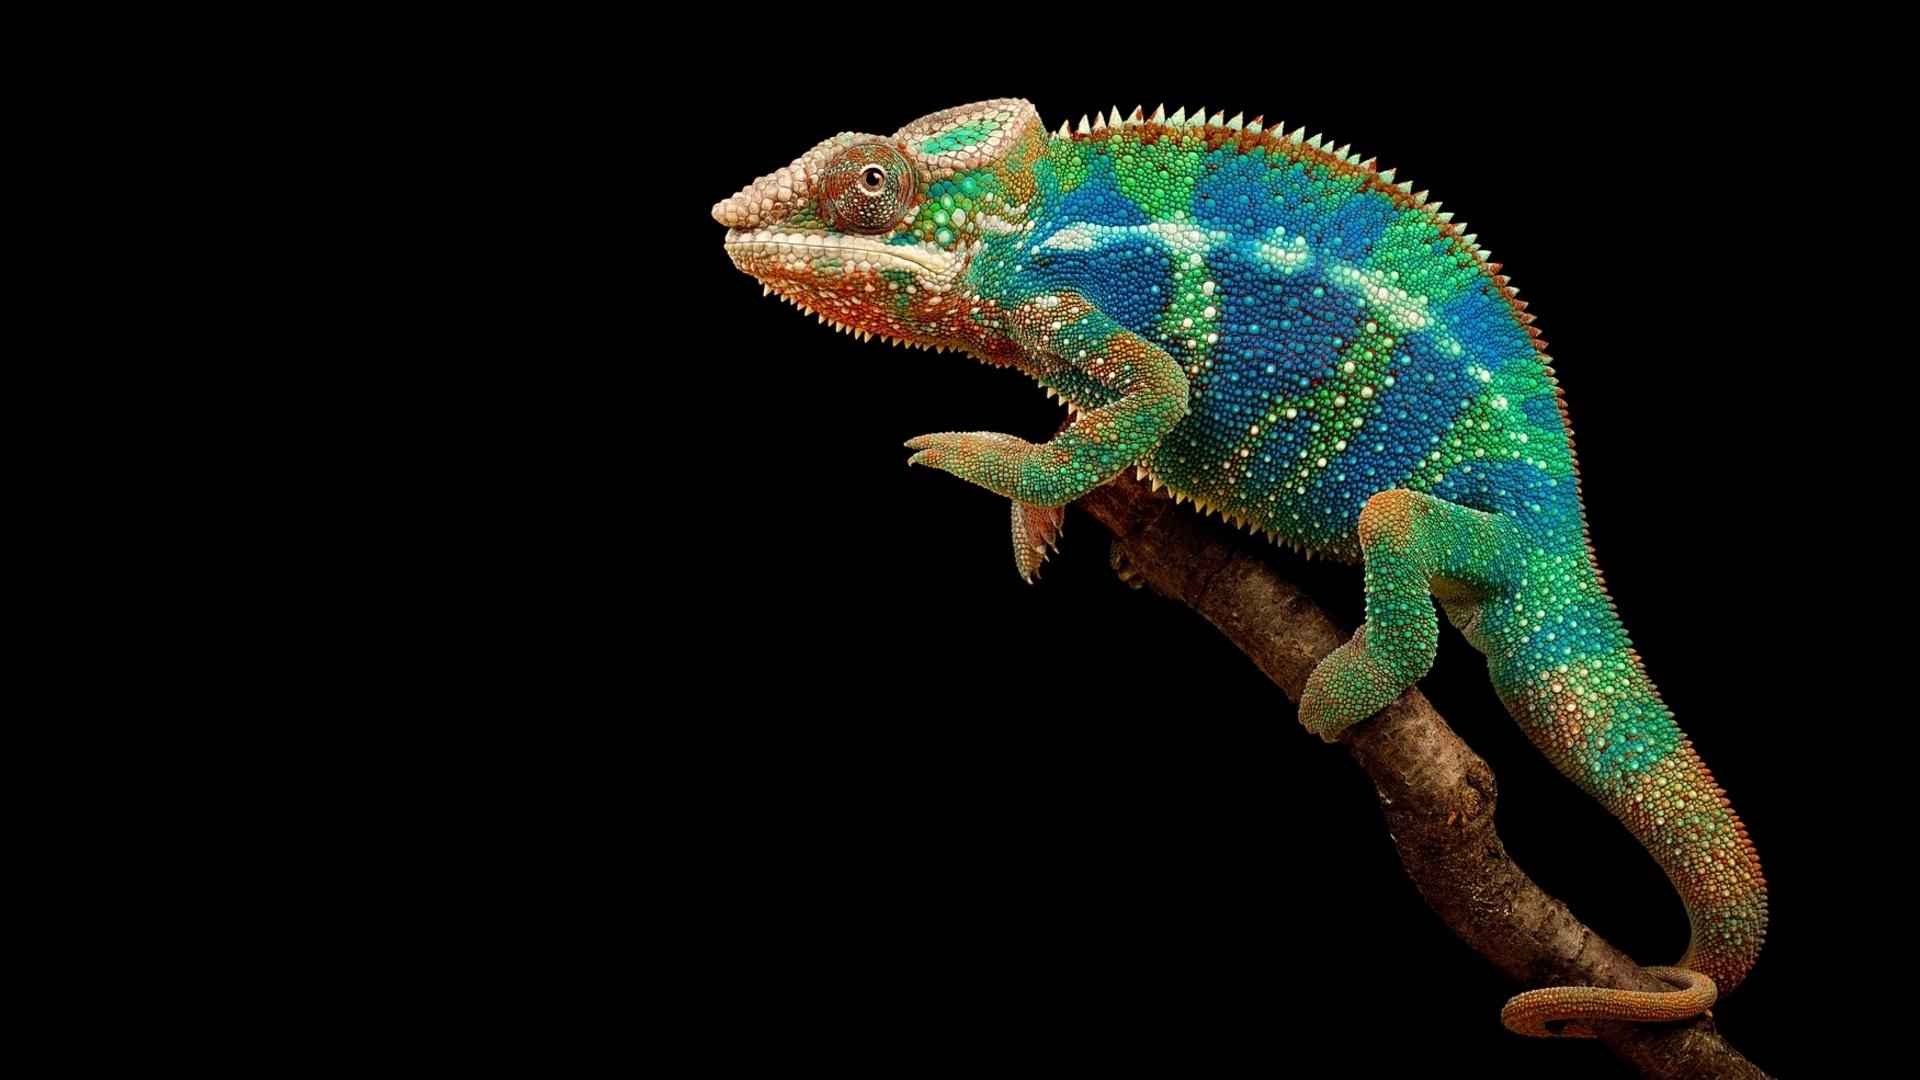 Colorful Chameleon Wallpaper